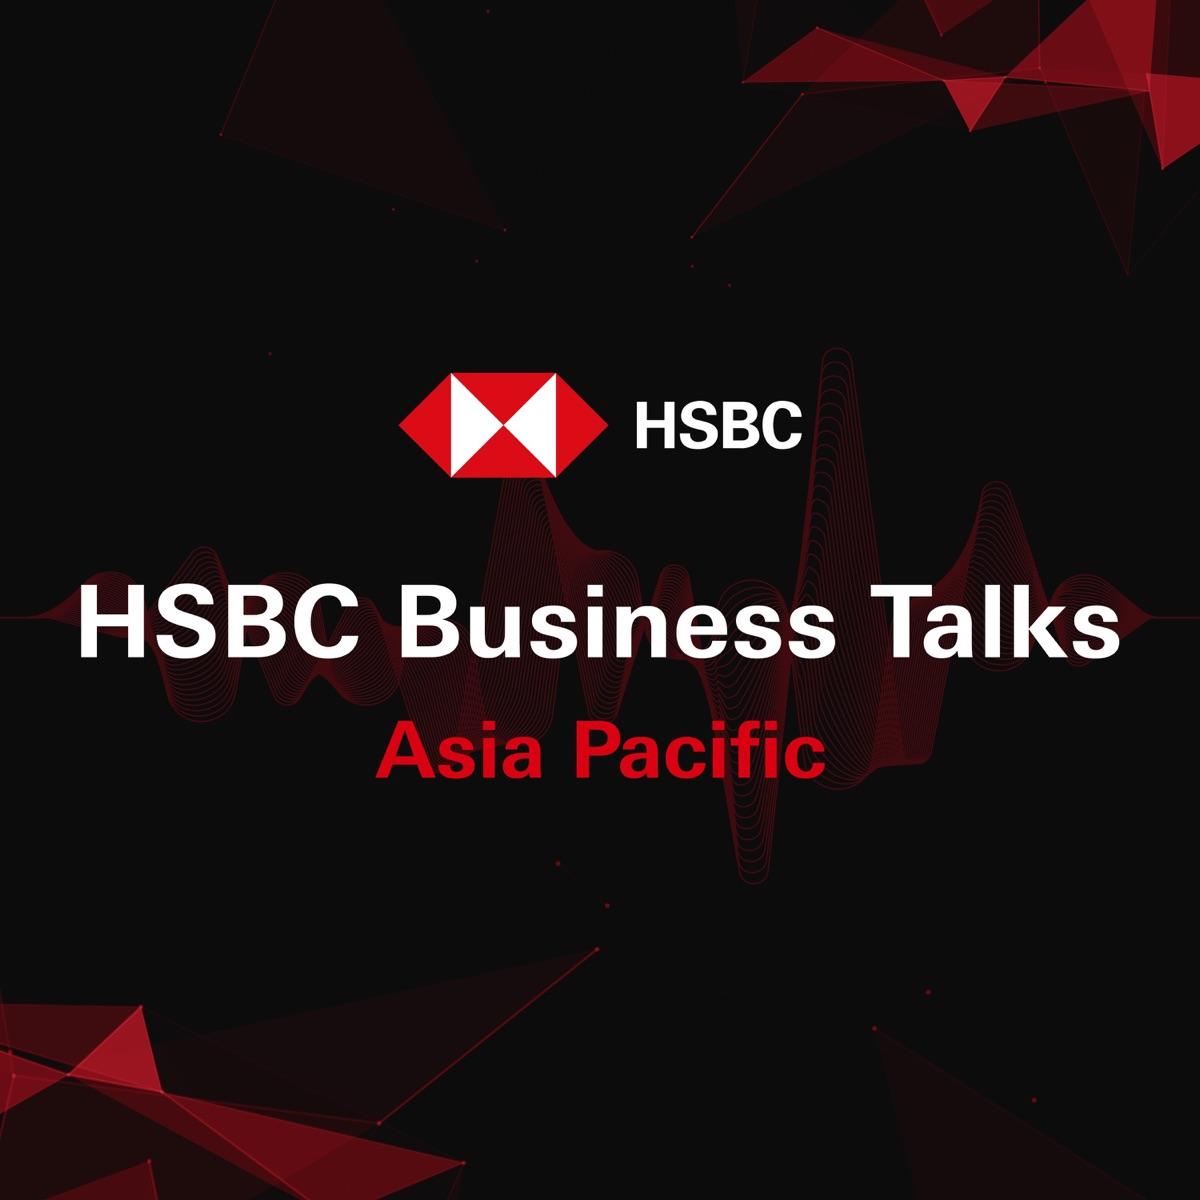 HSBC Business Talks - Asia Pacific